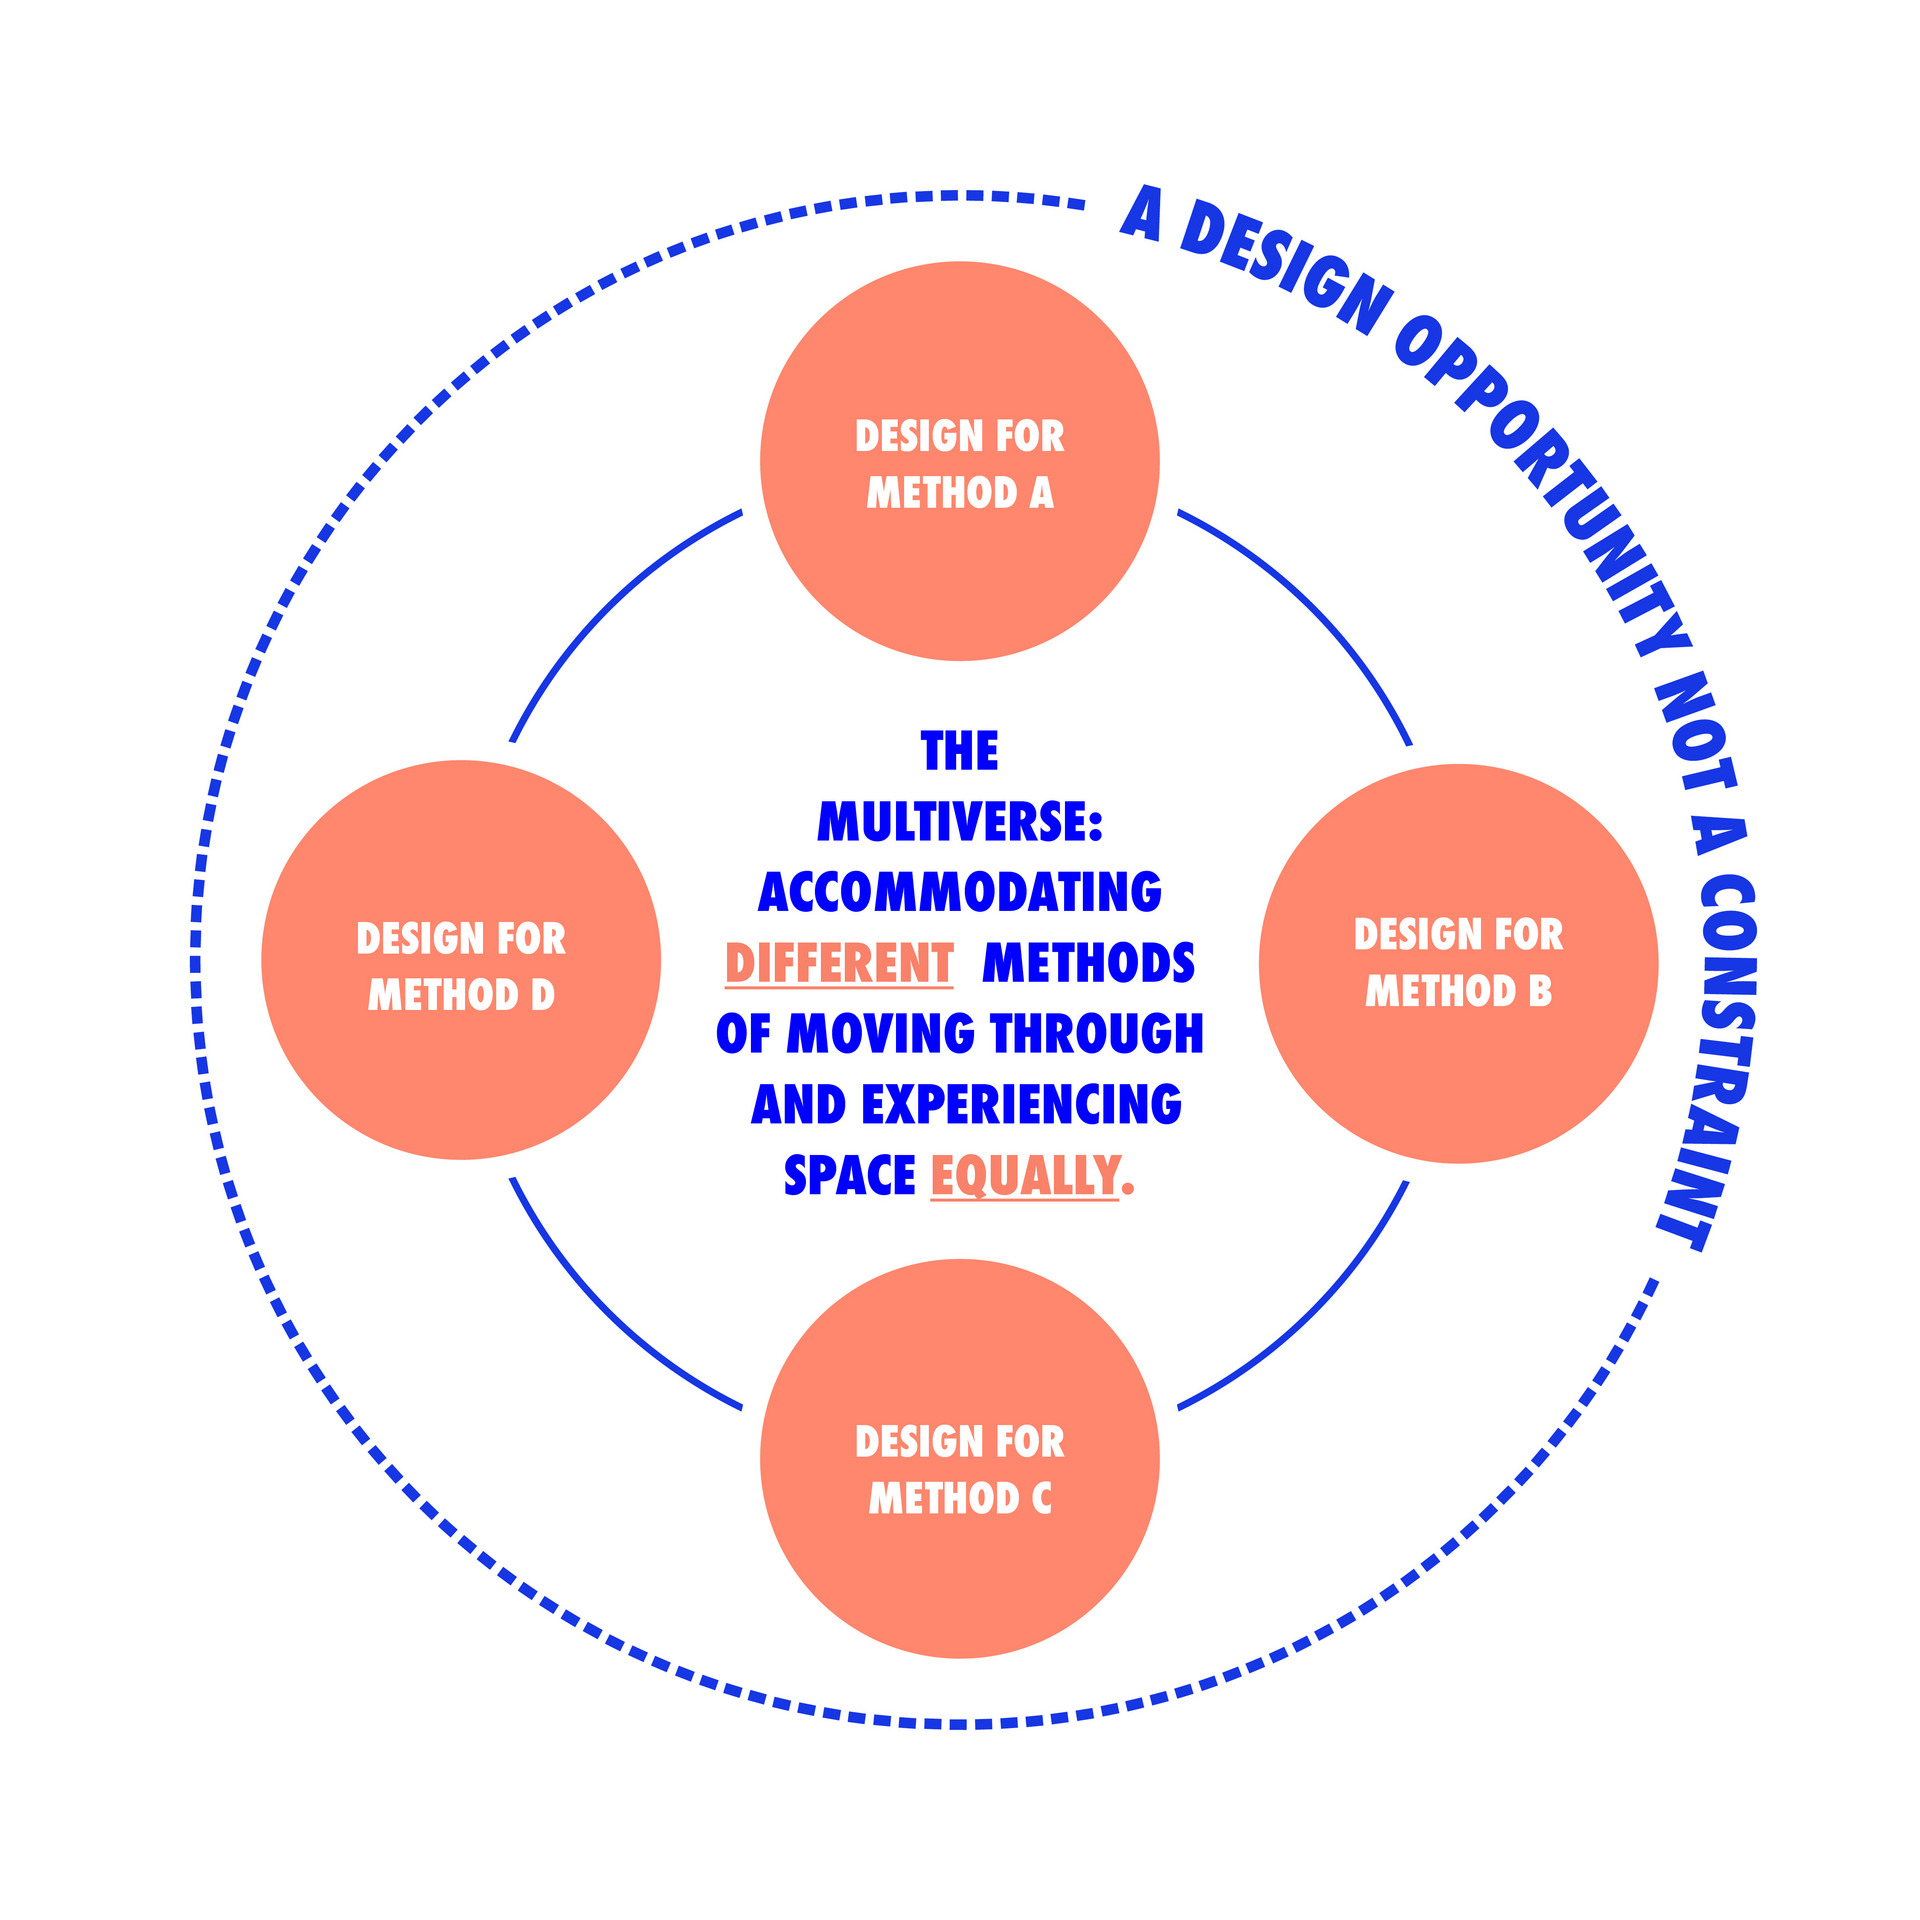 Diagramming Affirmative Design Practice